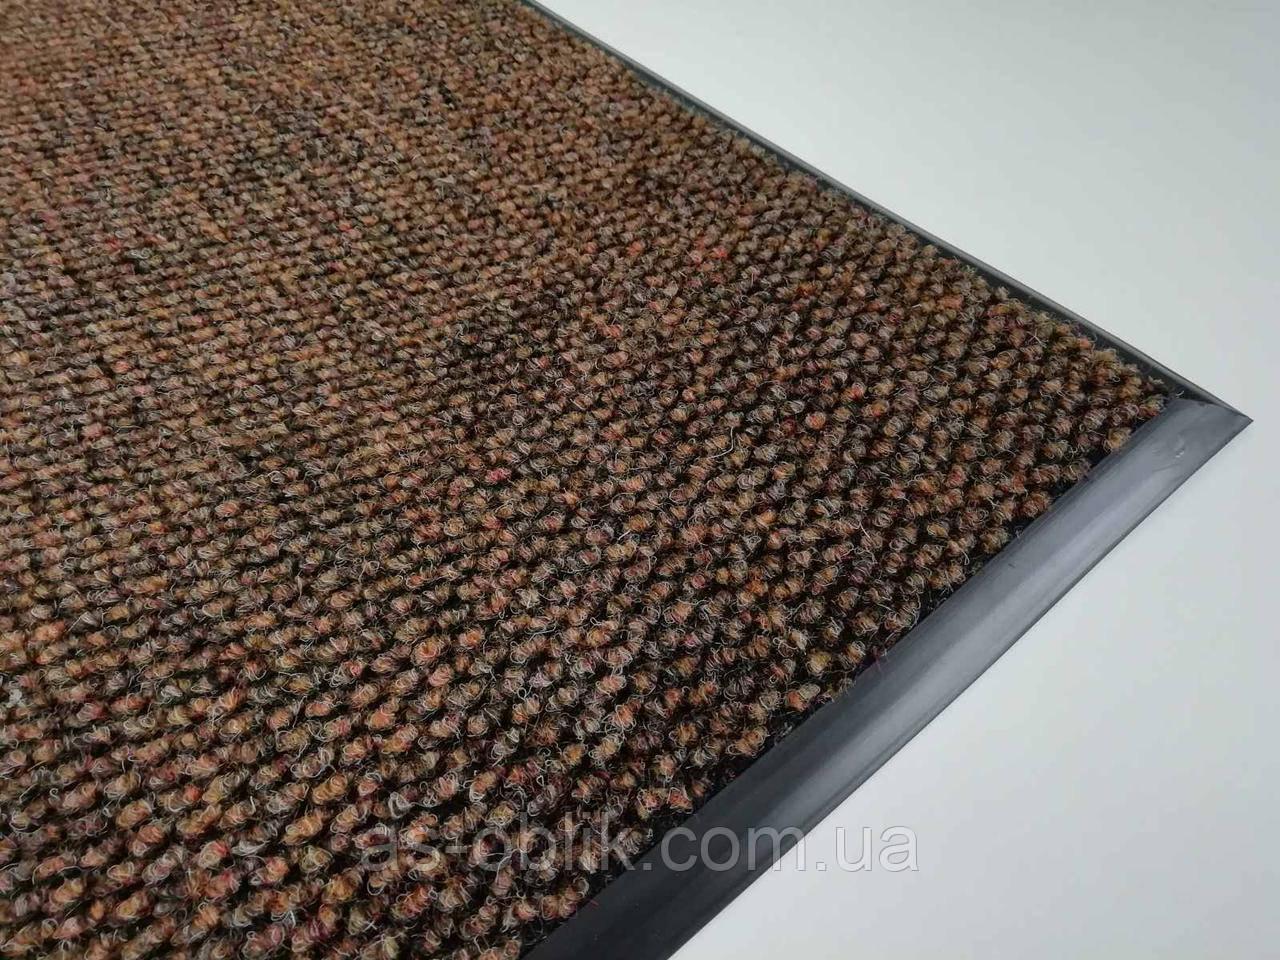 Коврик коричневый 80х100 см, Фаворит